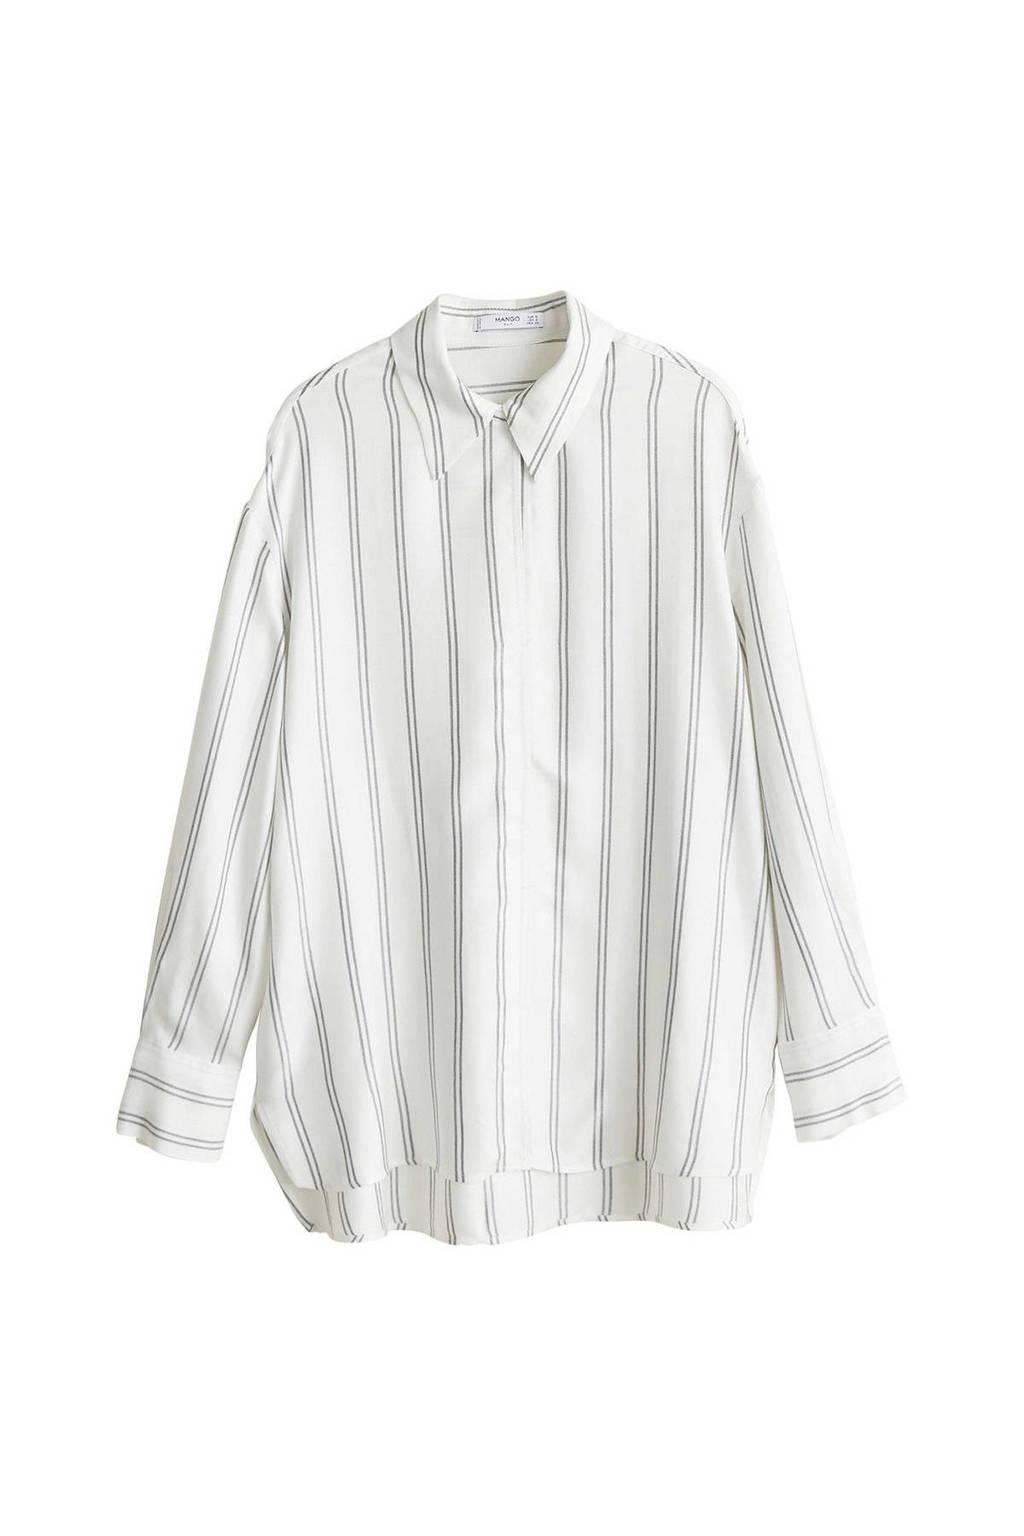 Mango oversized blouse wit, Witt/ Grijs